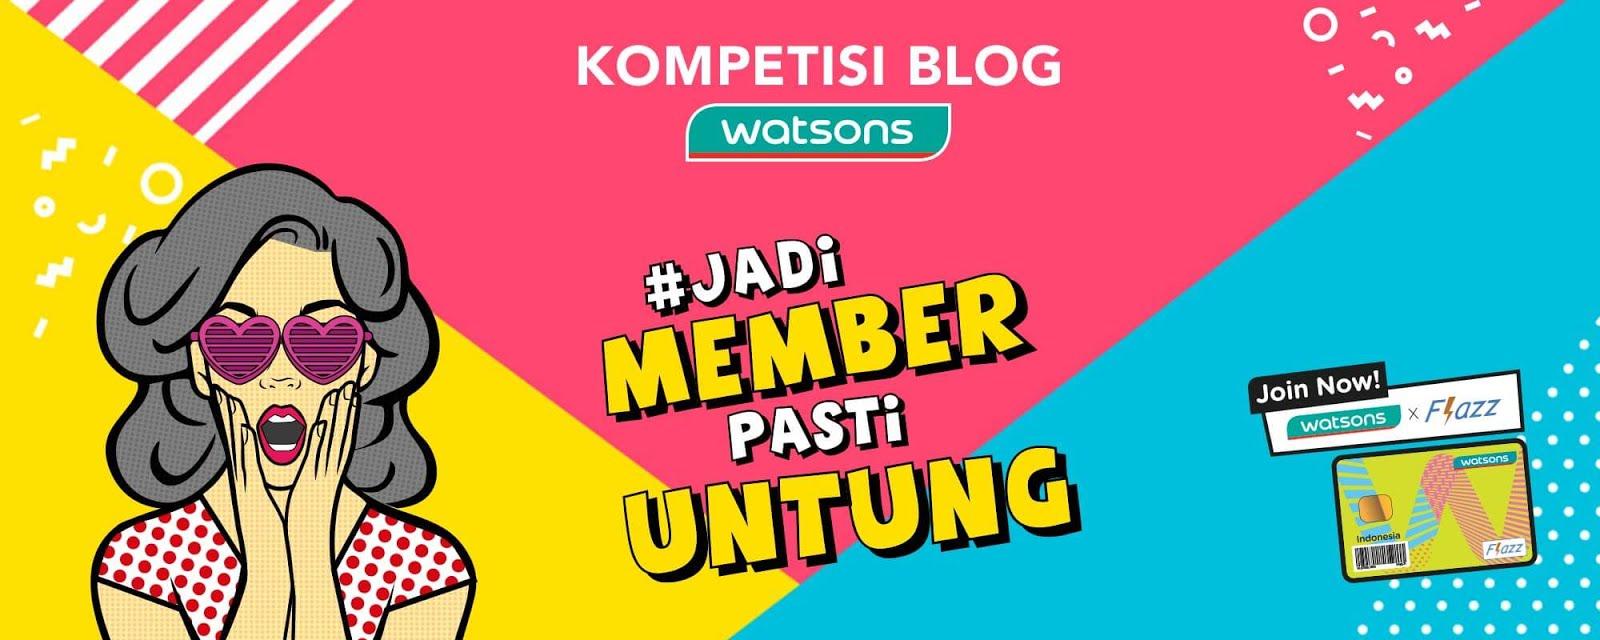 Kompetisi Blog Watsons #WatsonsBlog #JadiMemberPastiUntung